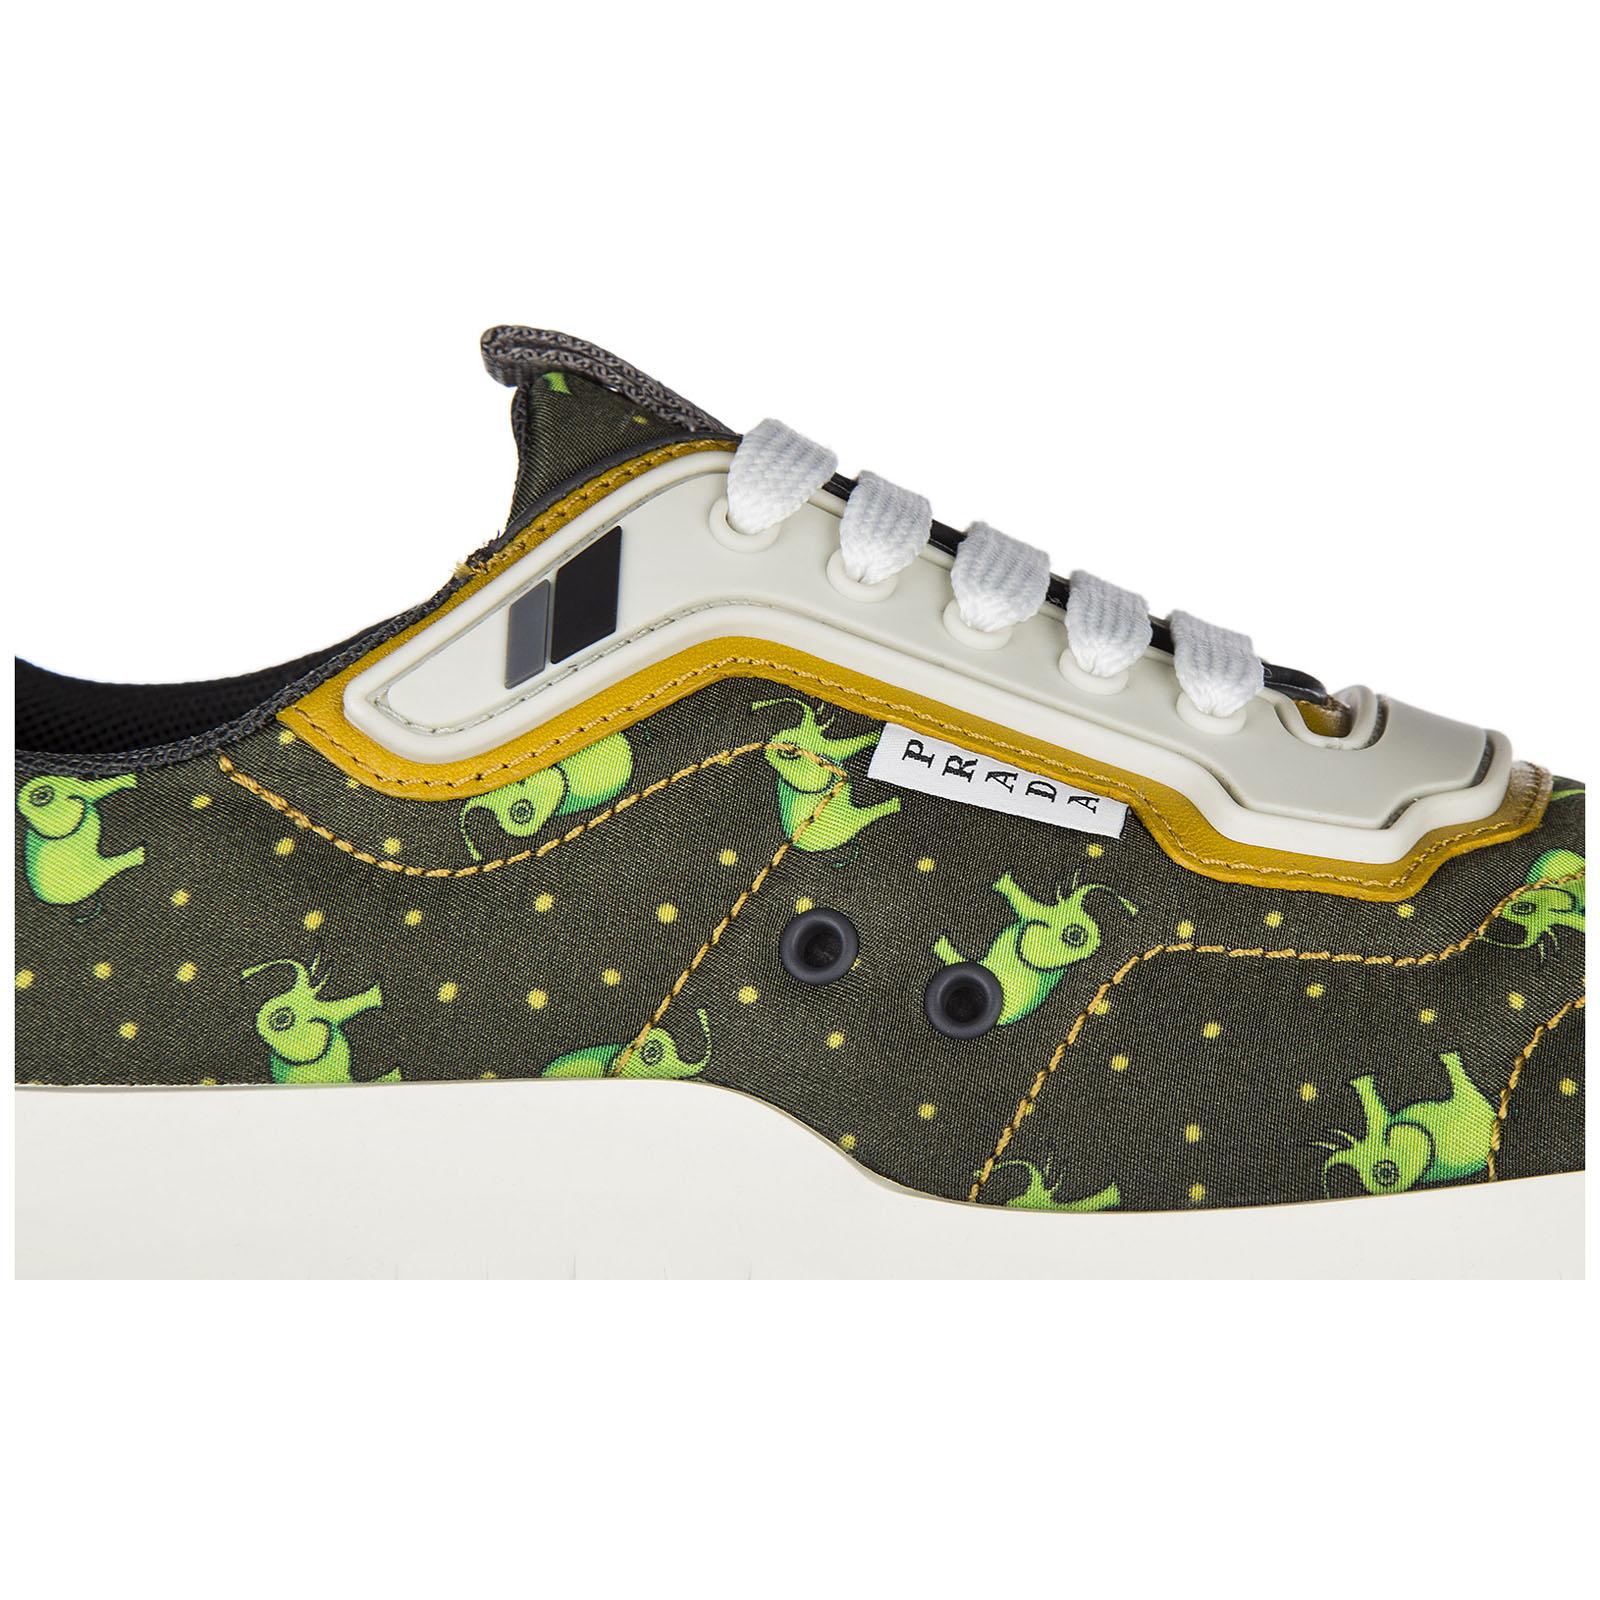 Scarpe sneakers uomo in nylon steele